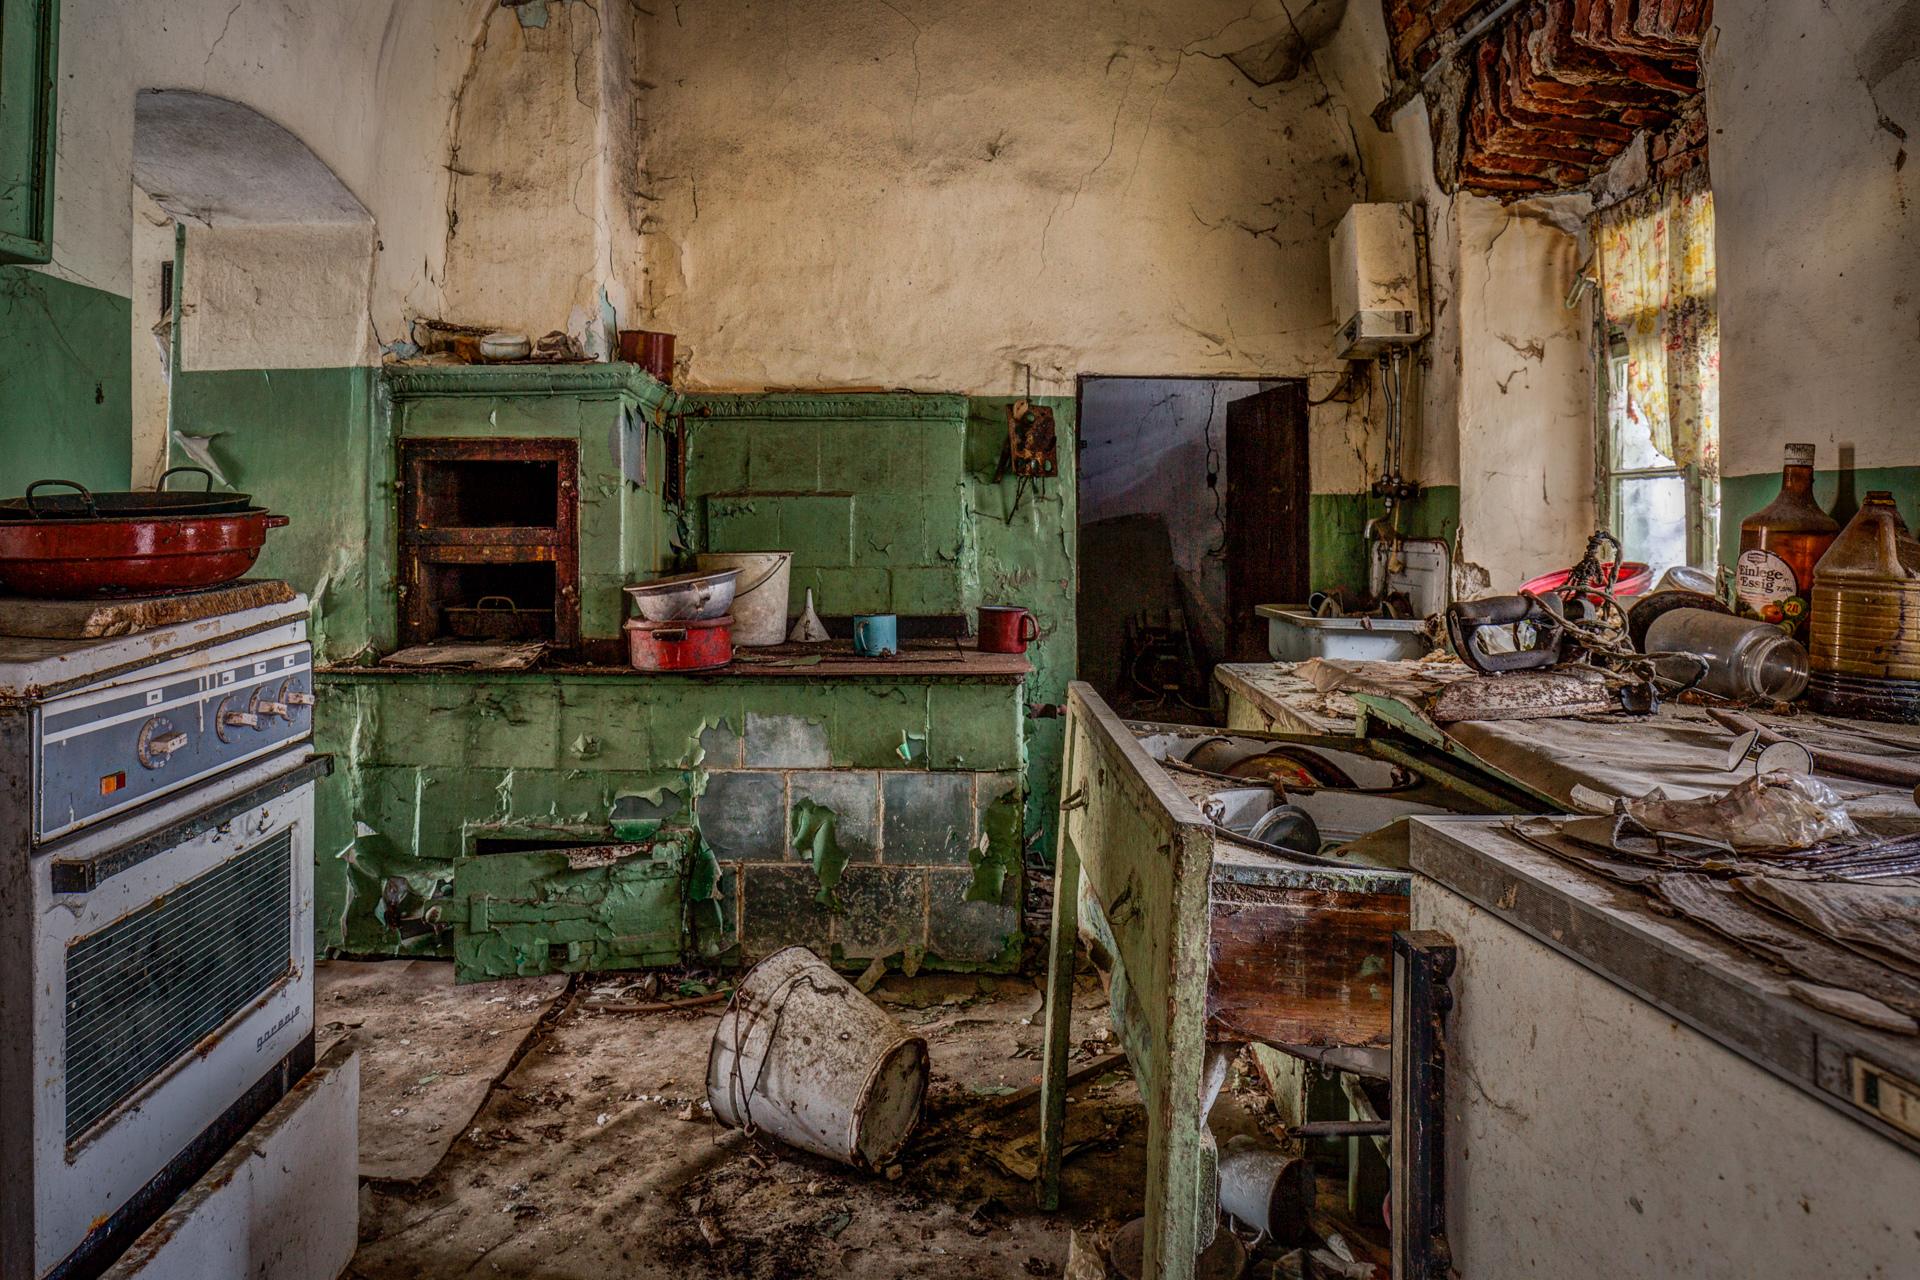 Urban Exploration - Farmhouse Bed and Breakfast - Redundancy